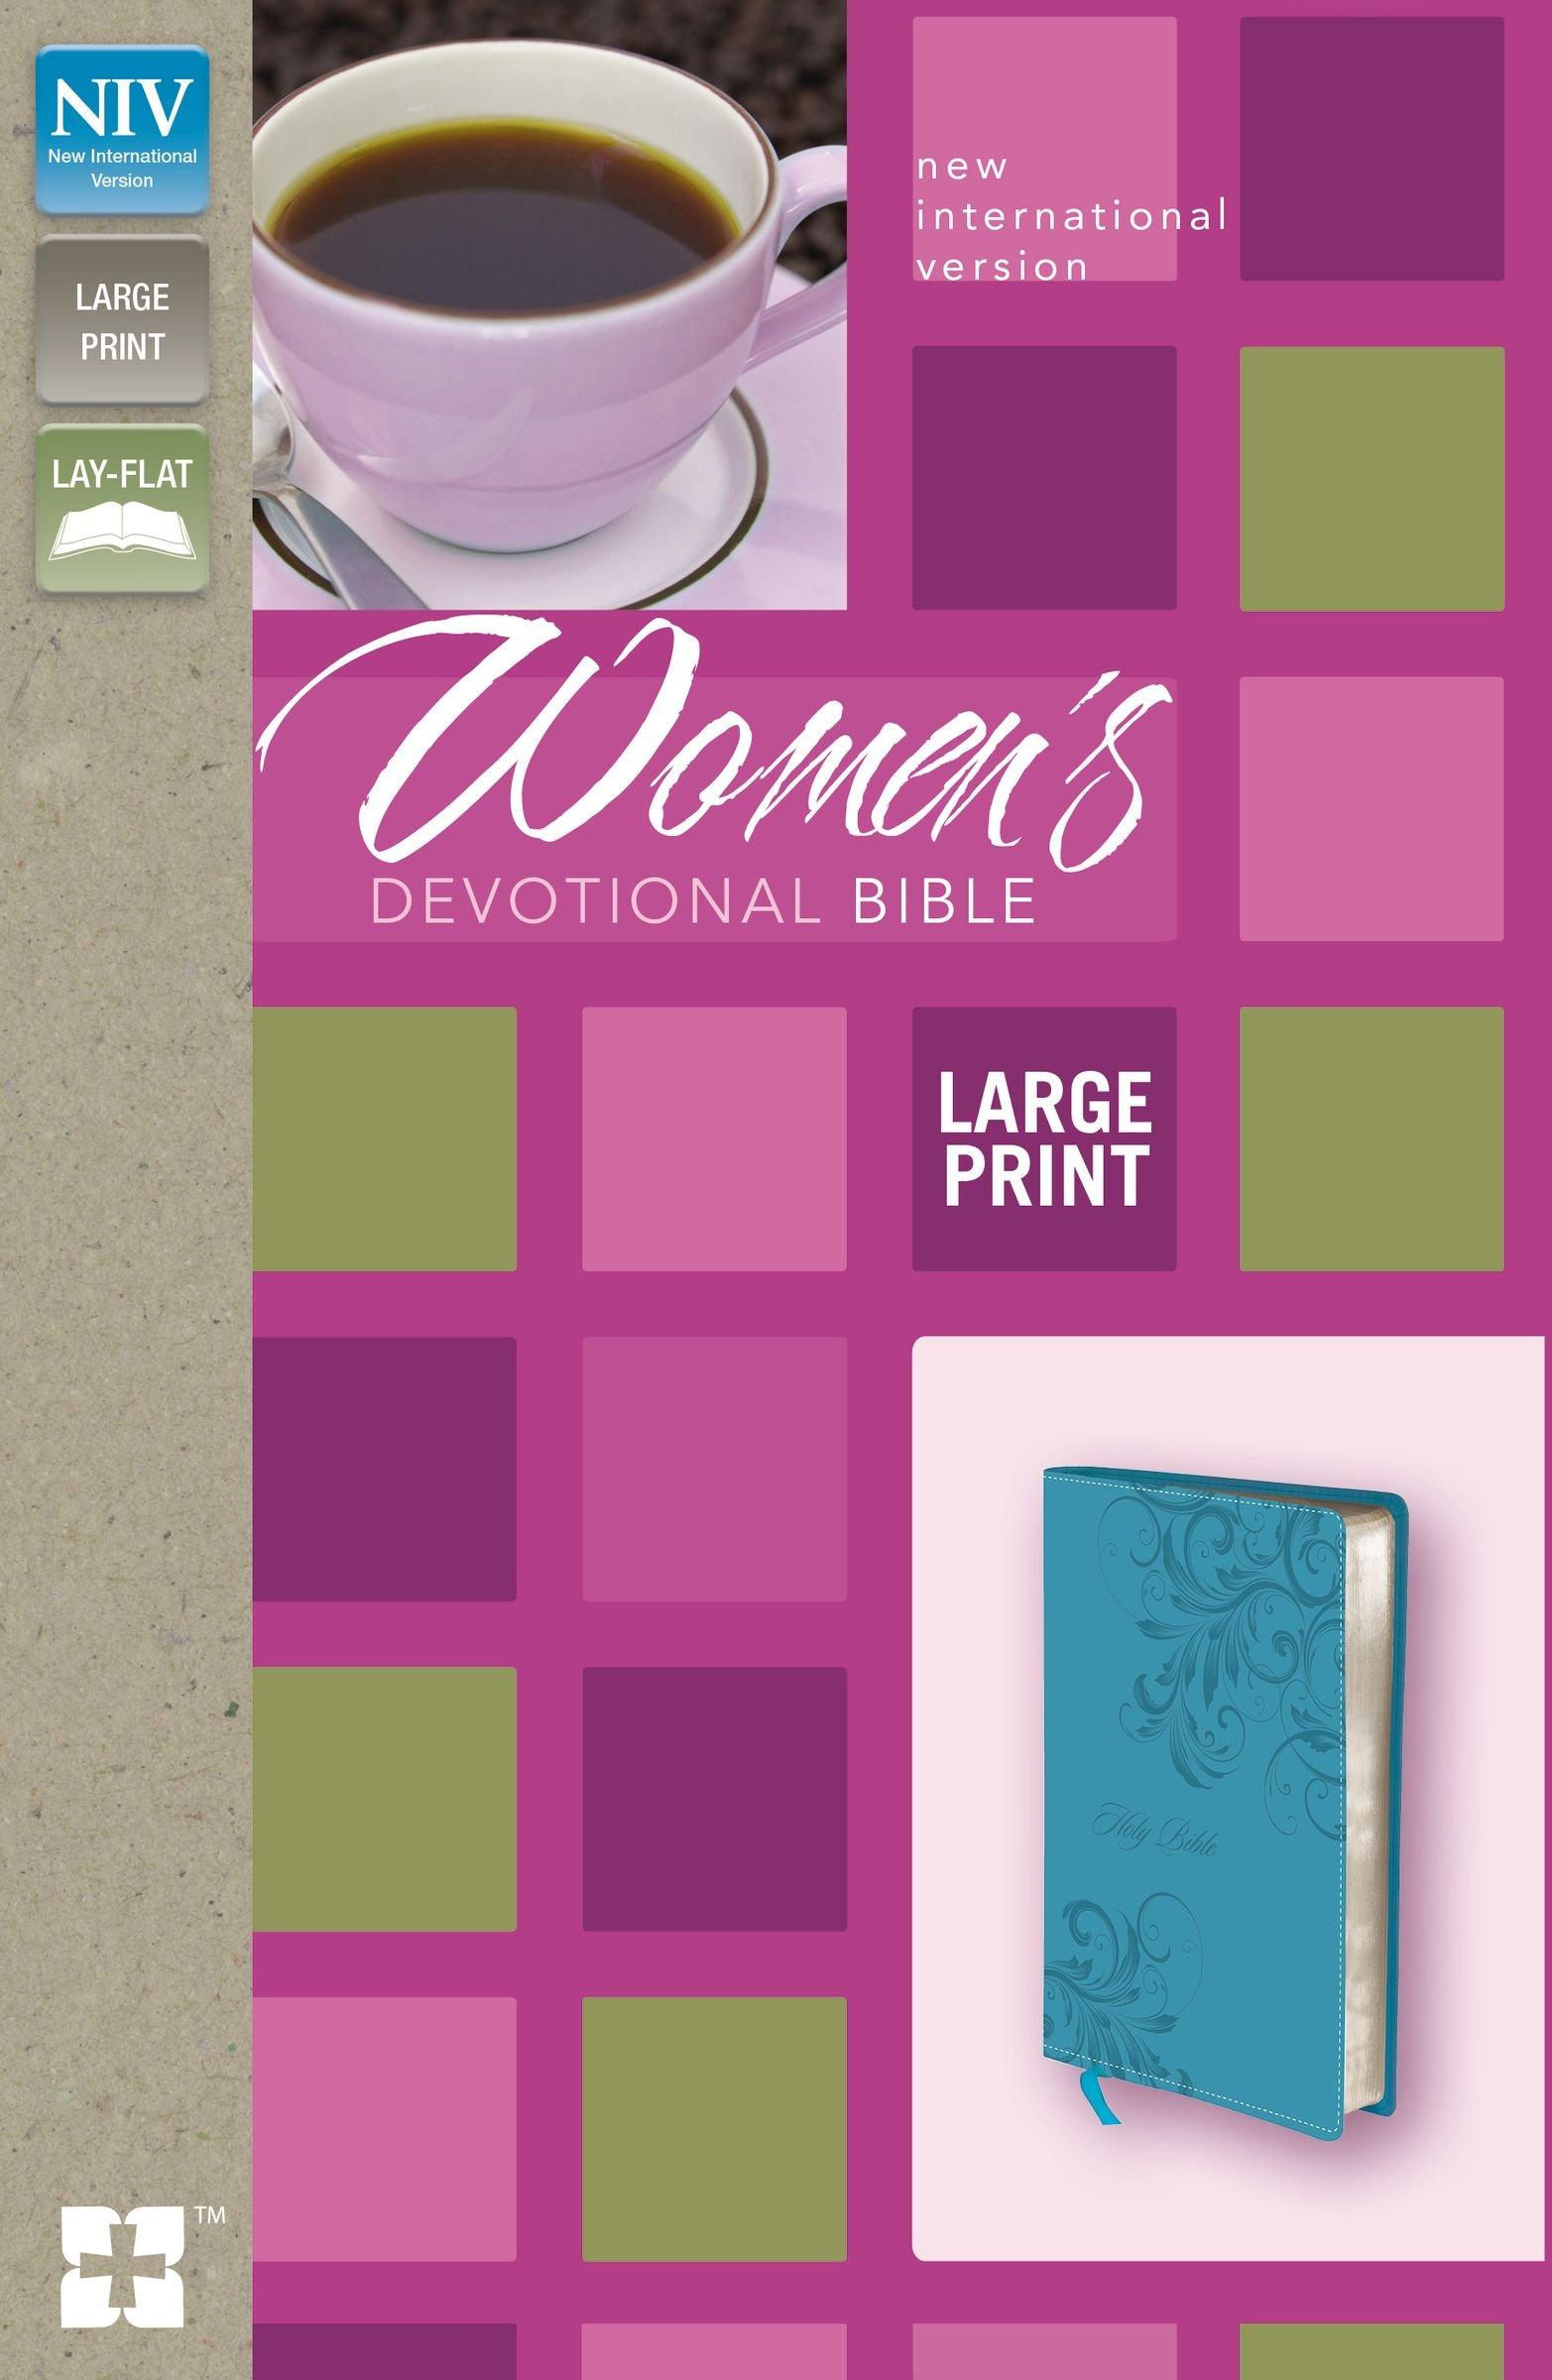 Womens Devotional Bible Imitation Leather product image